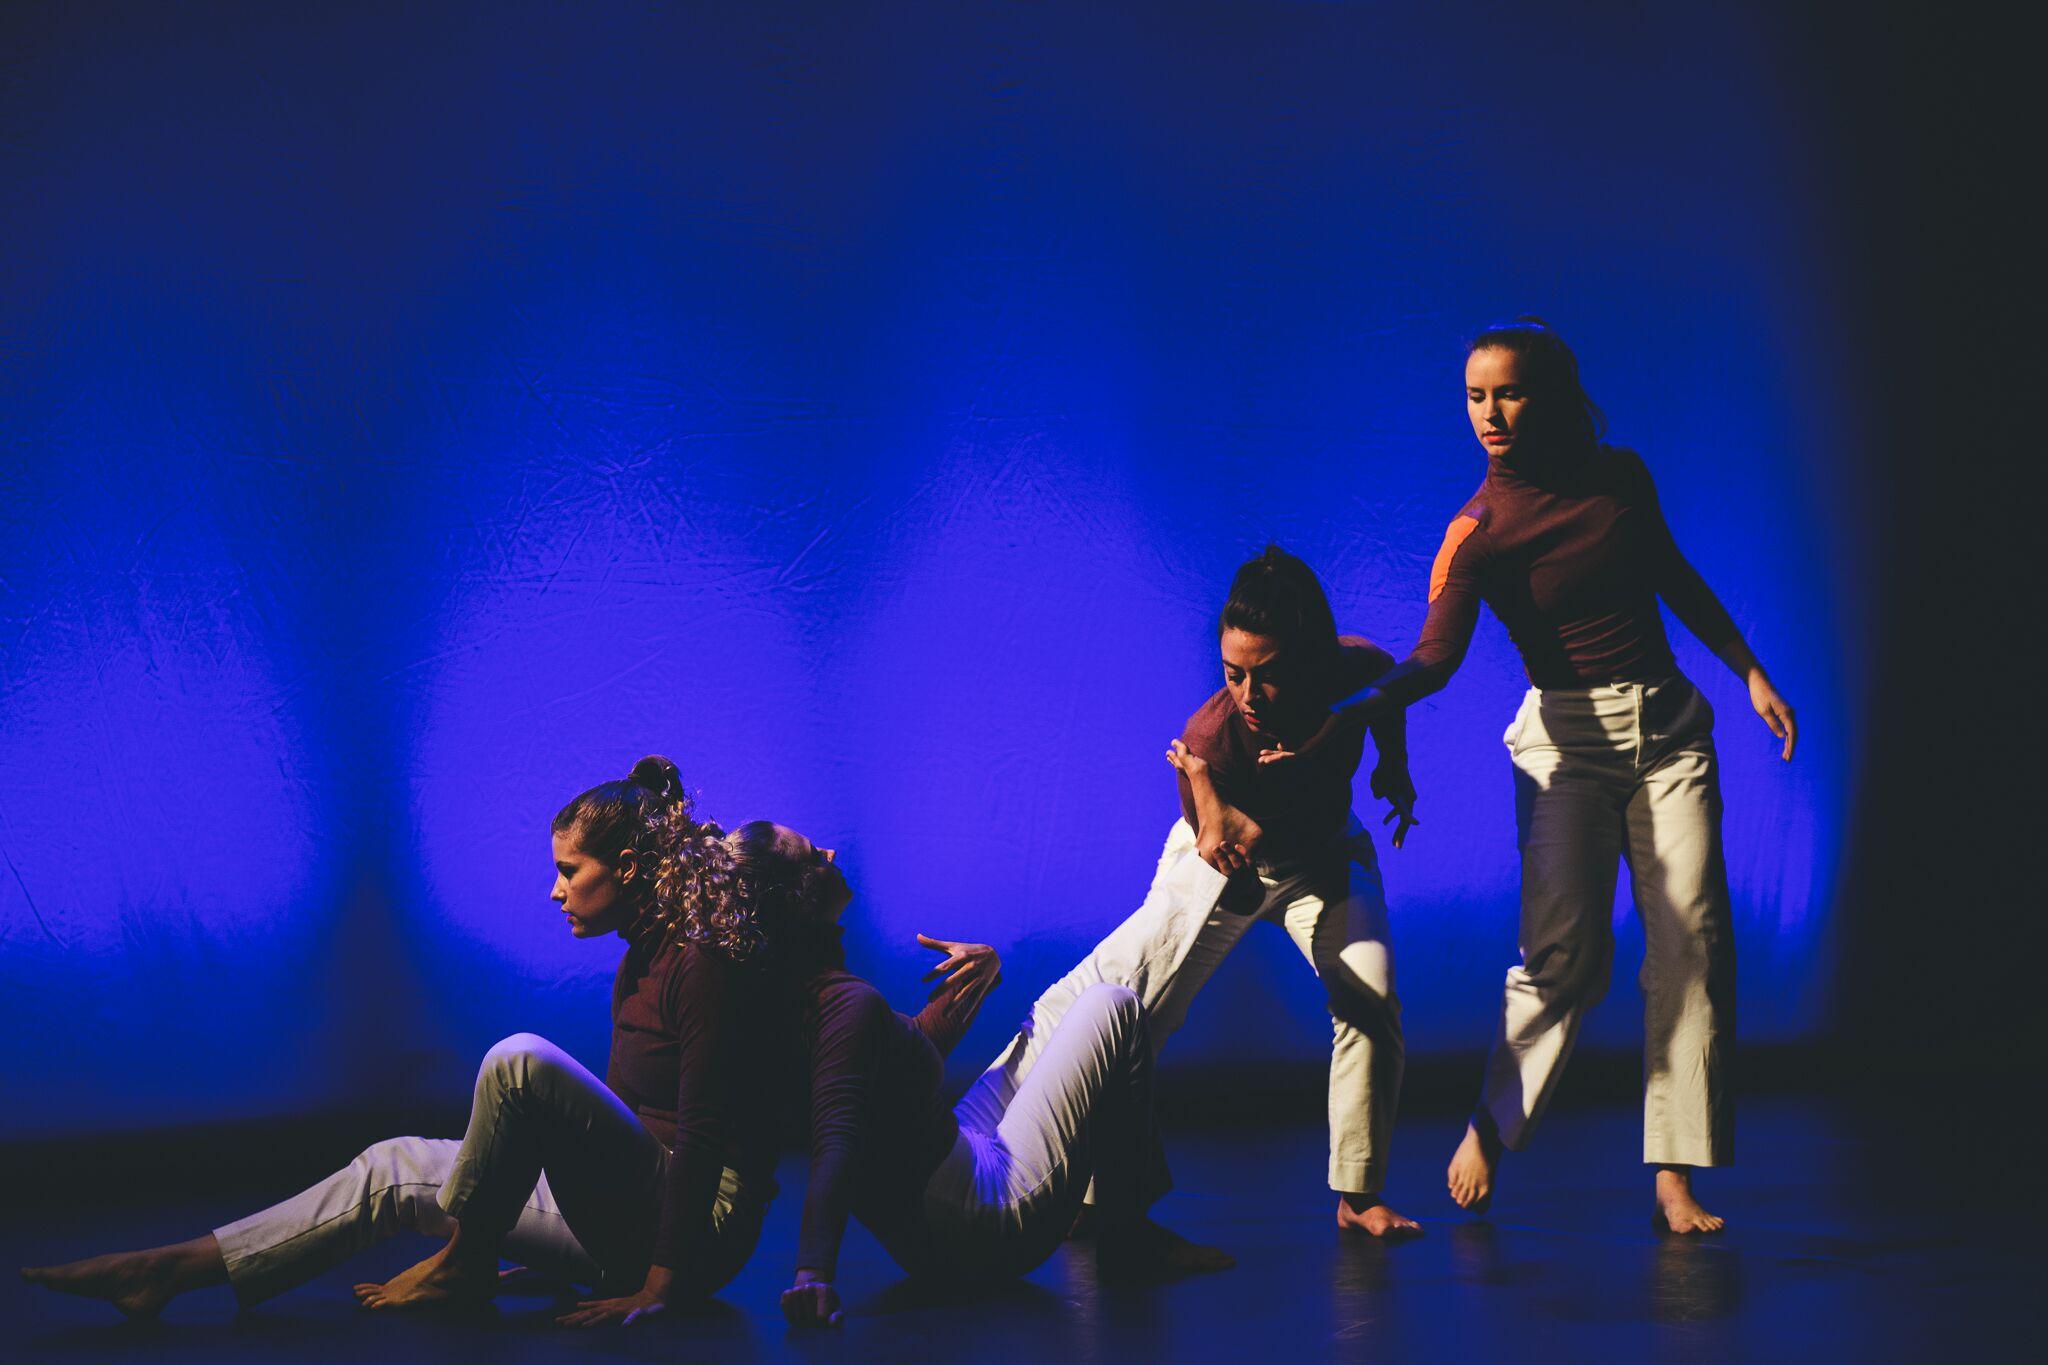 Dancers: Taryn Lavery, Hailley Laurèn, Alex Miller, Lucy Wilson